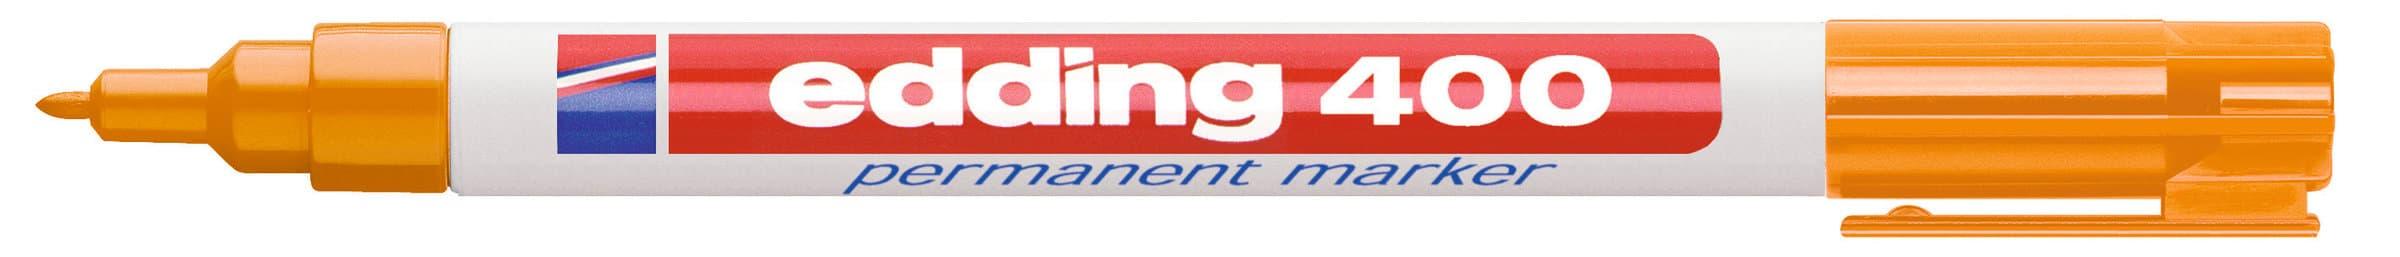 Edding edding marcatore 400